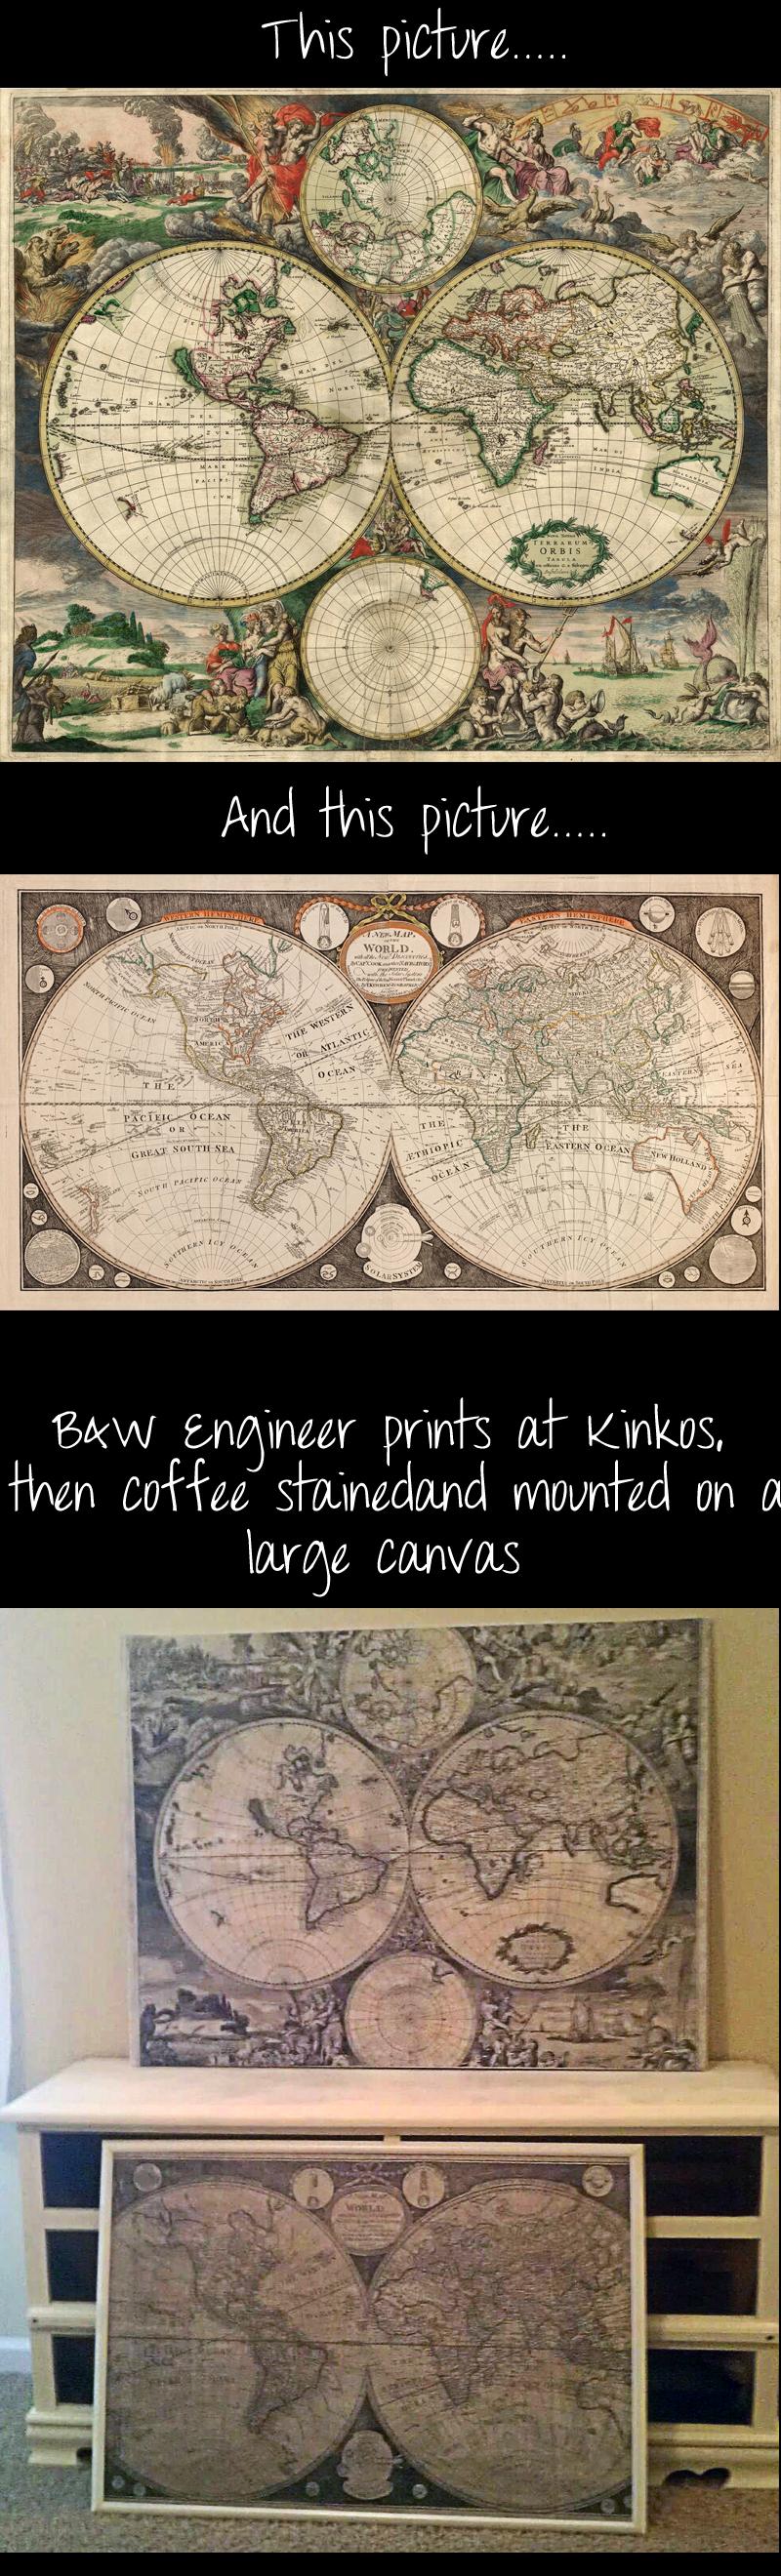 Diy world map teacoffee stain mod podge engineer prints large diy world map teacoffee stain mod podge engineer prints large gumiabroncs Gallery